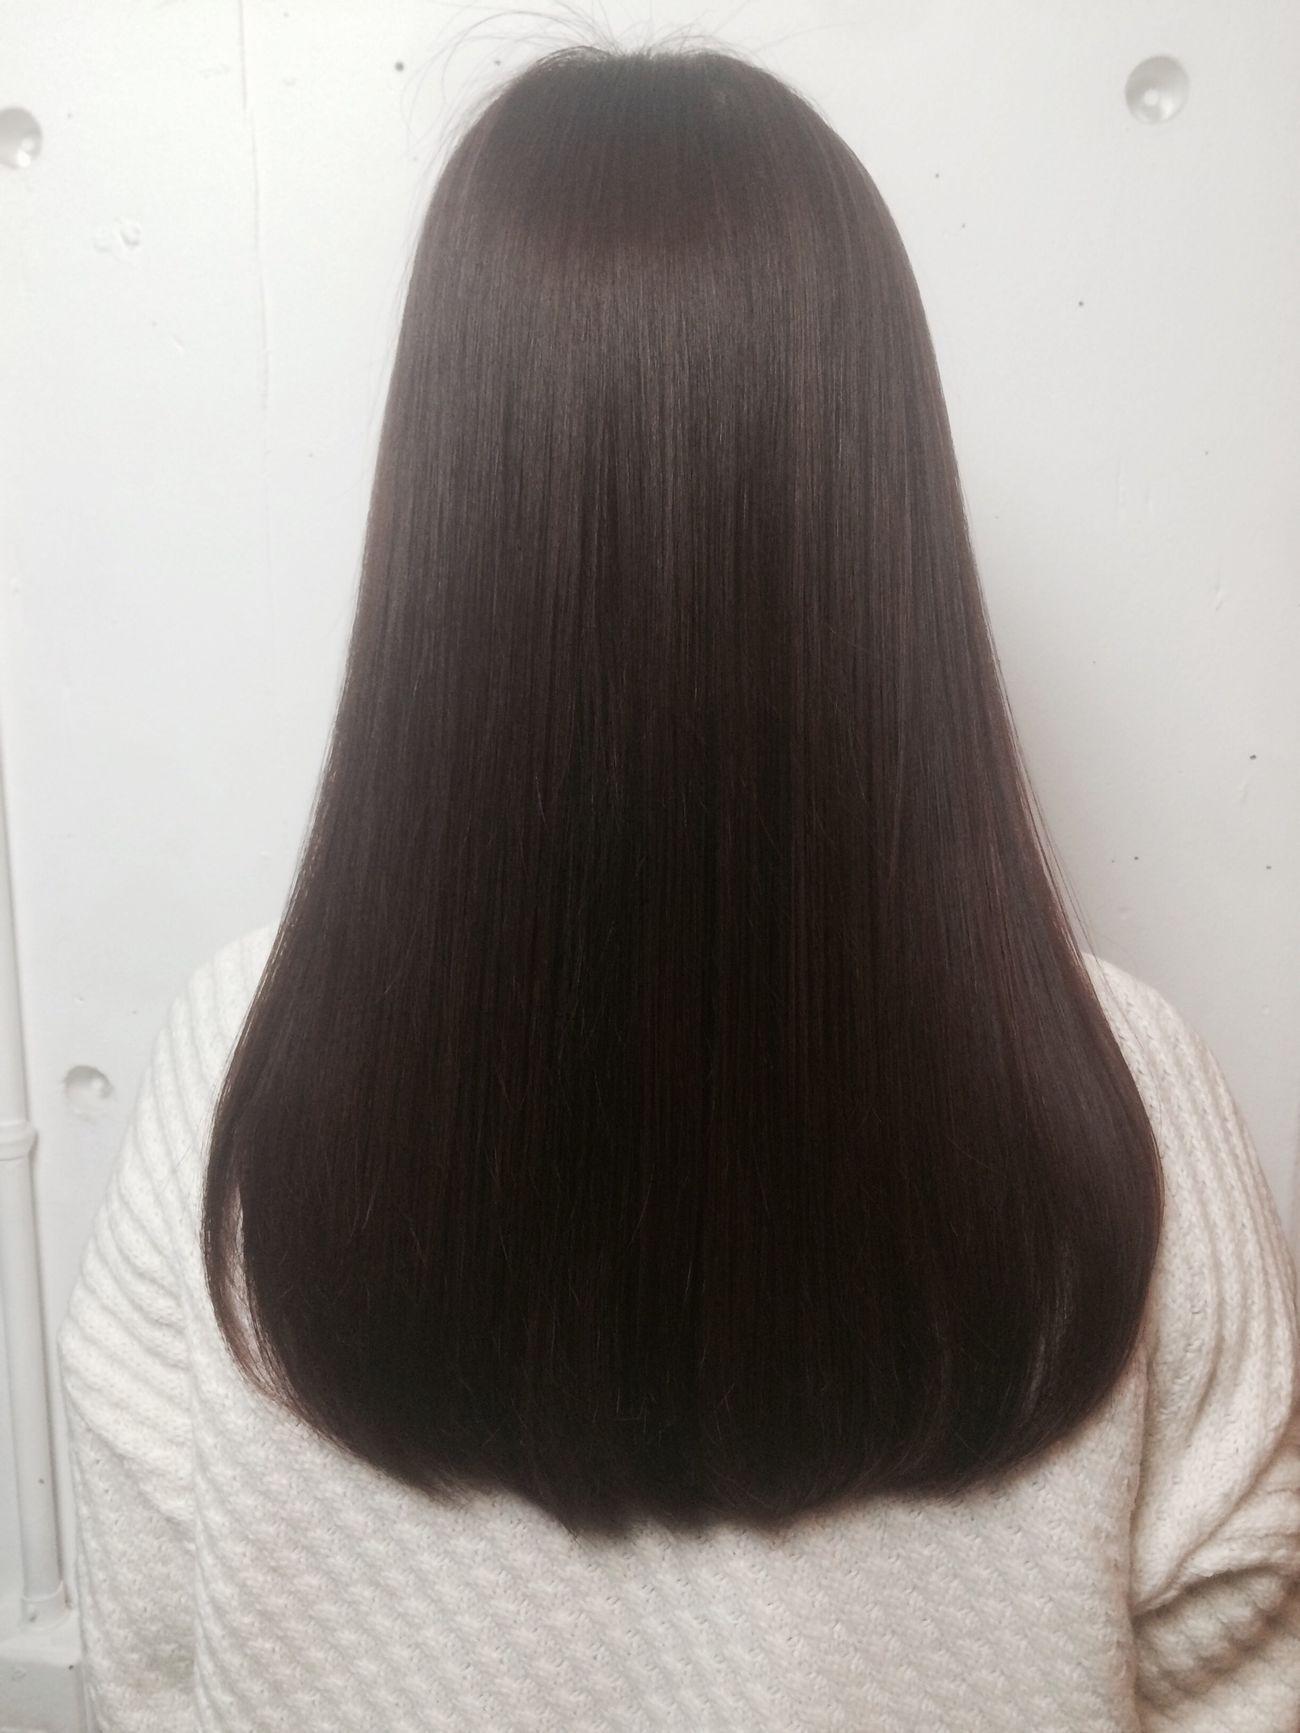 Hairdresser Haircut Haircolor Hairstyle Hairsalon 東京 表参道 青山 原宿 渋谷 サロンモデル カットモデル カラーモデル パーマモデル 撮影モデル 撮影 募集中